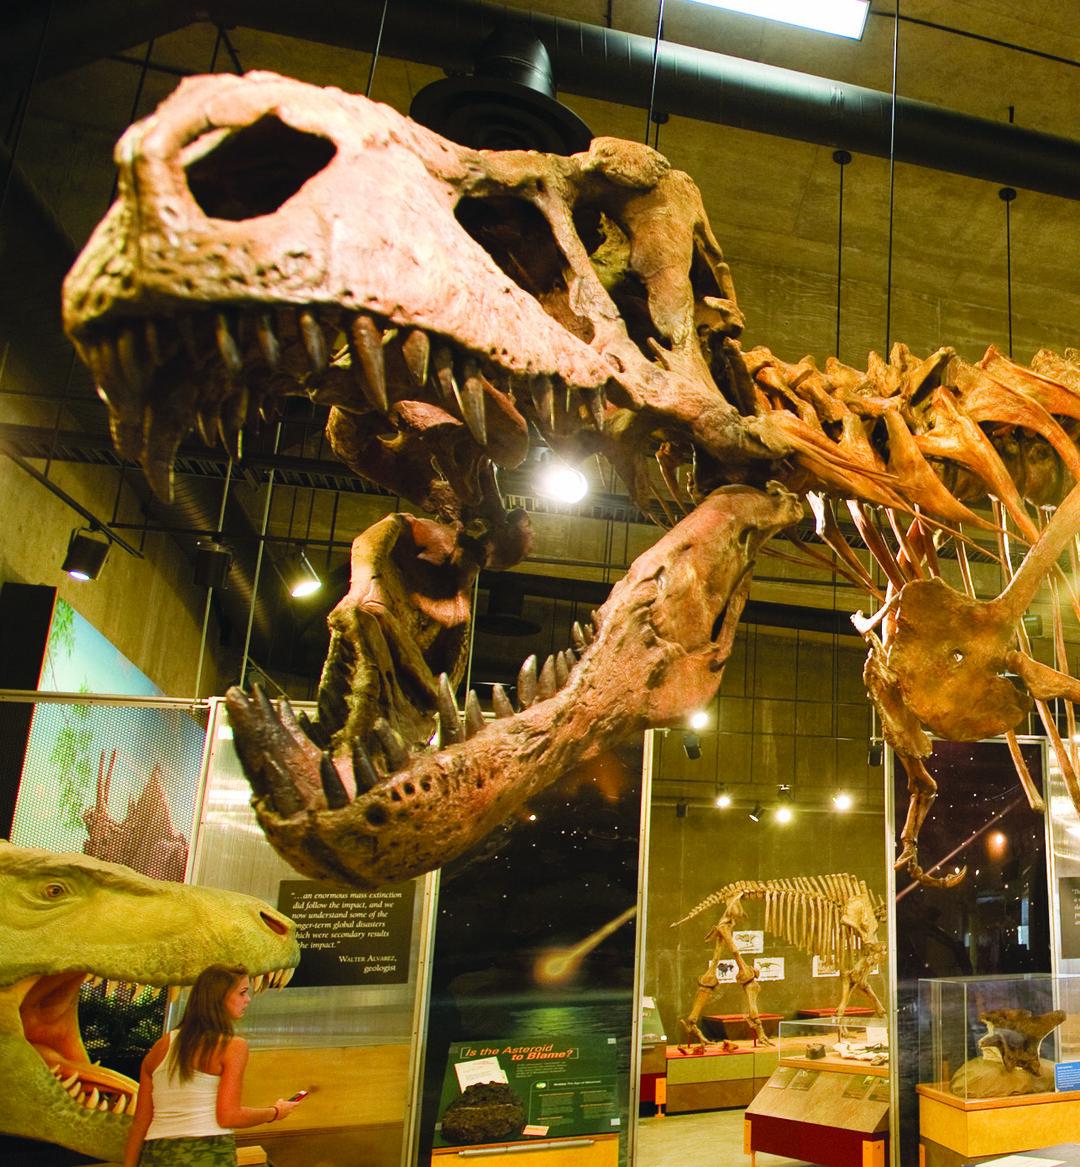 Page 12 of Experience Saskatchewan's Dinosaur Trails